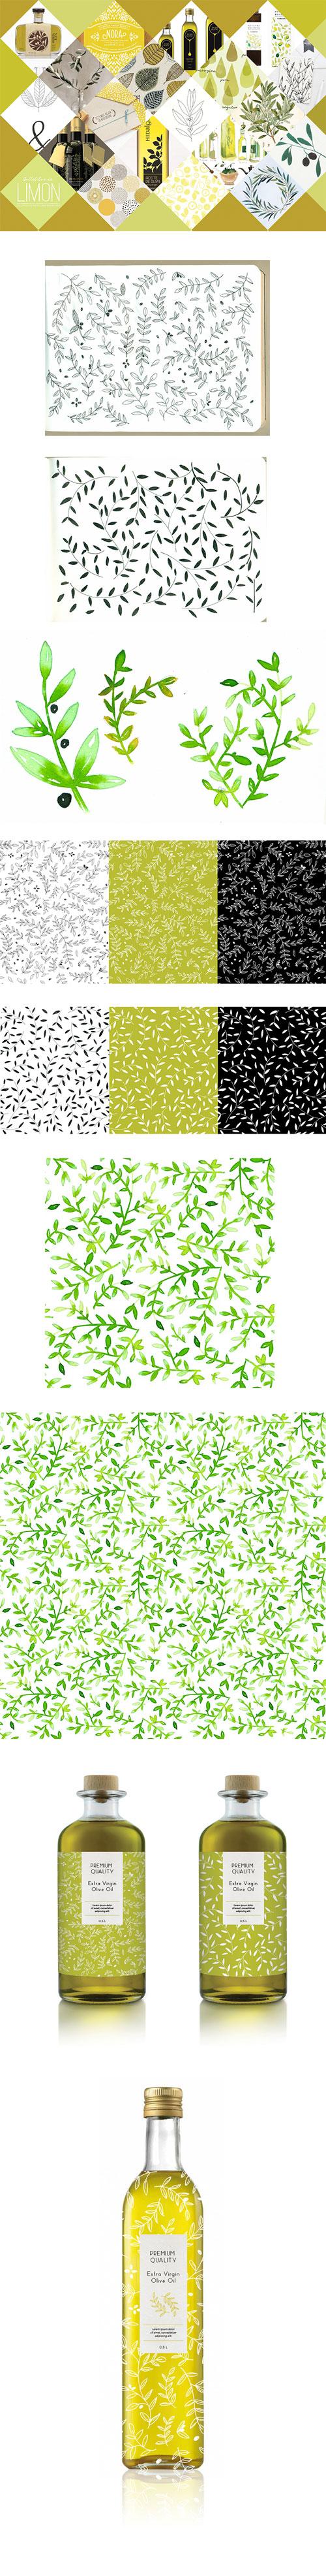 presentation-olive-oil-copy